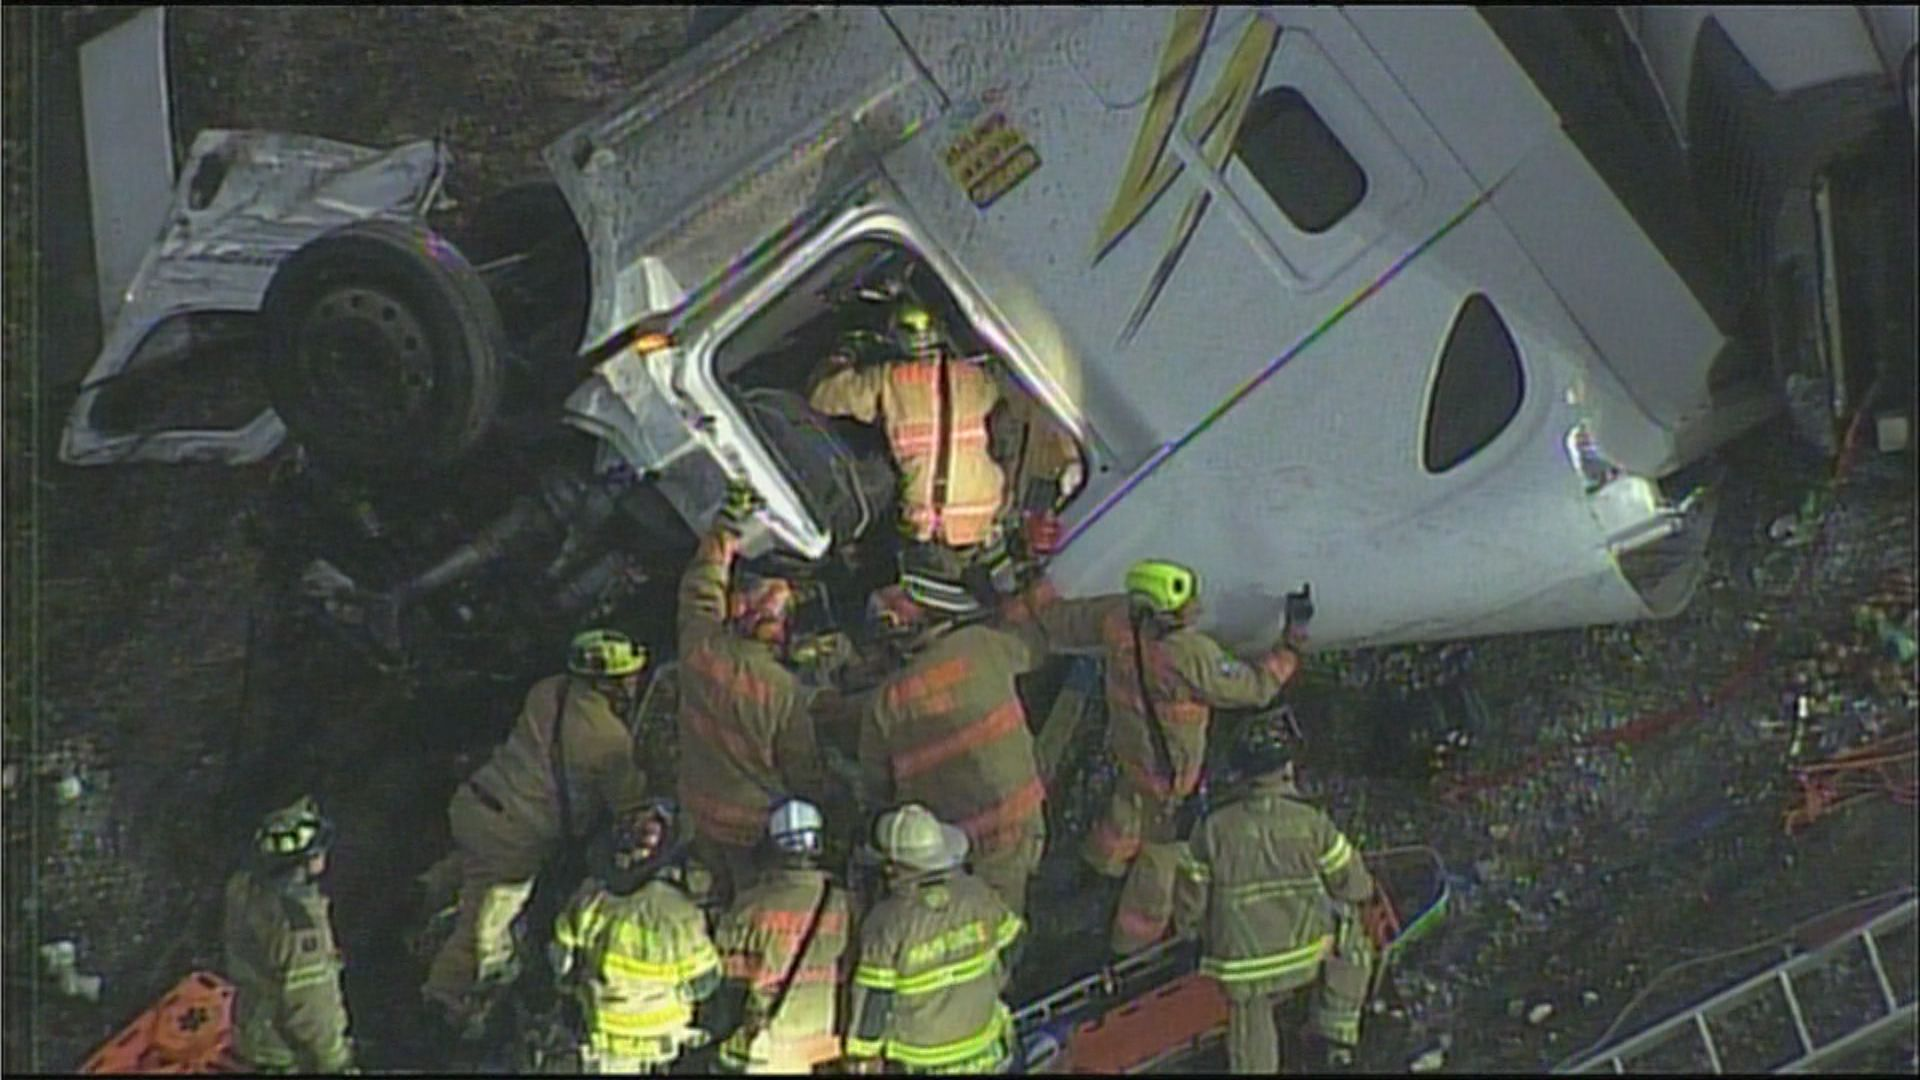 Semi truck crash on Turnpike.